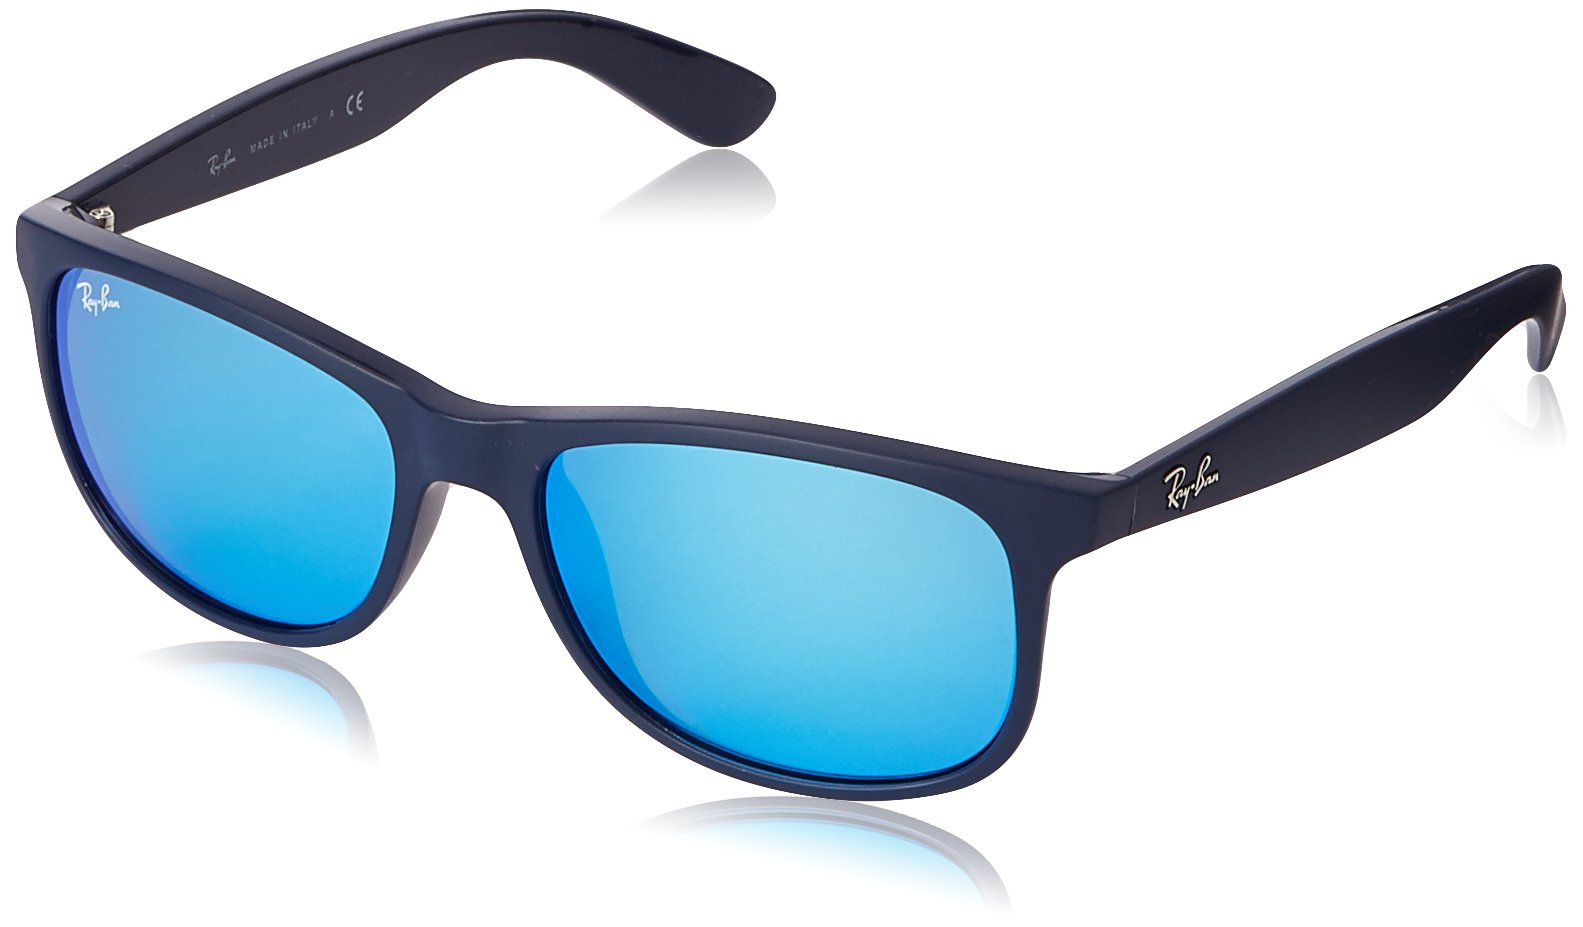 Homme On LunettesAzulshiny Blue Montures Top55 Matte Ray De 4202 ban v7Ib6yYfg